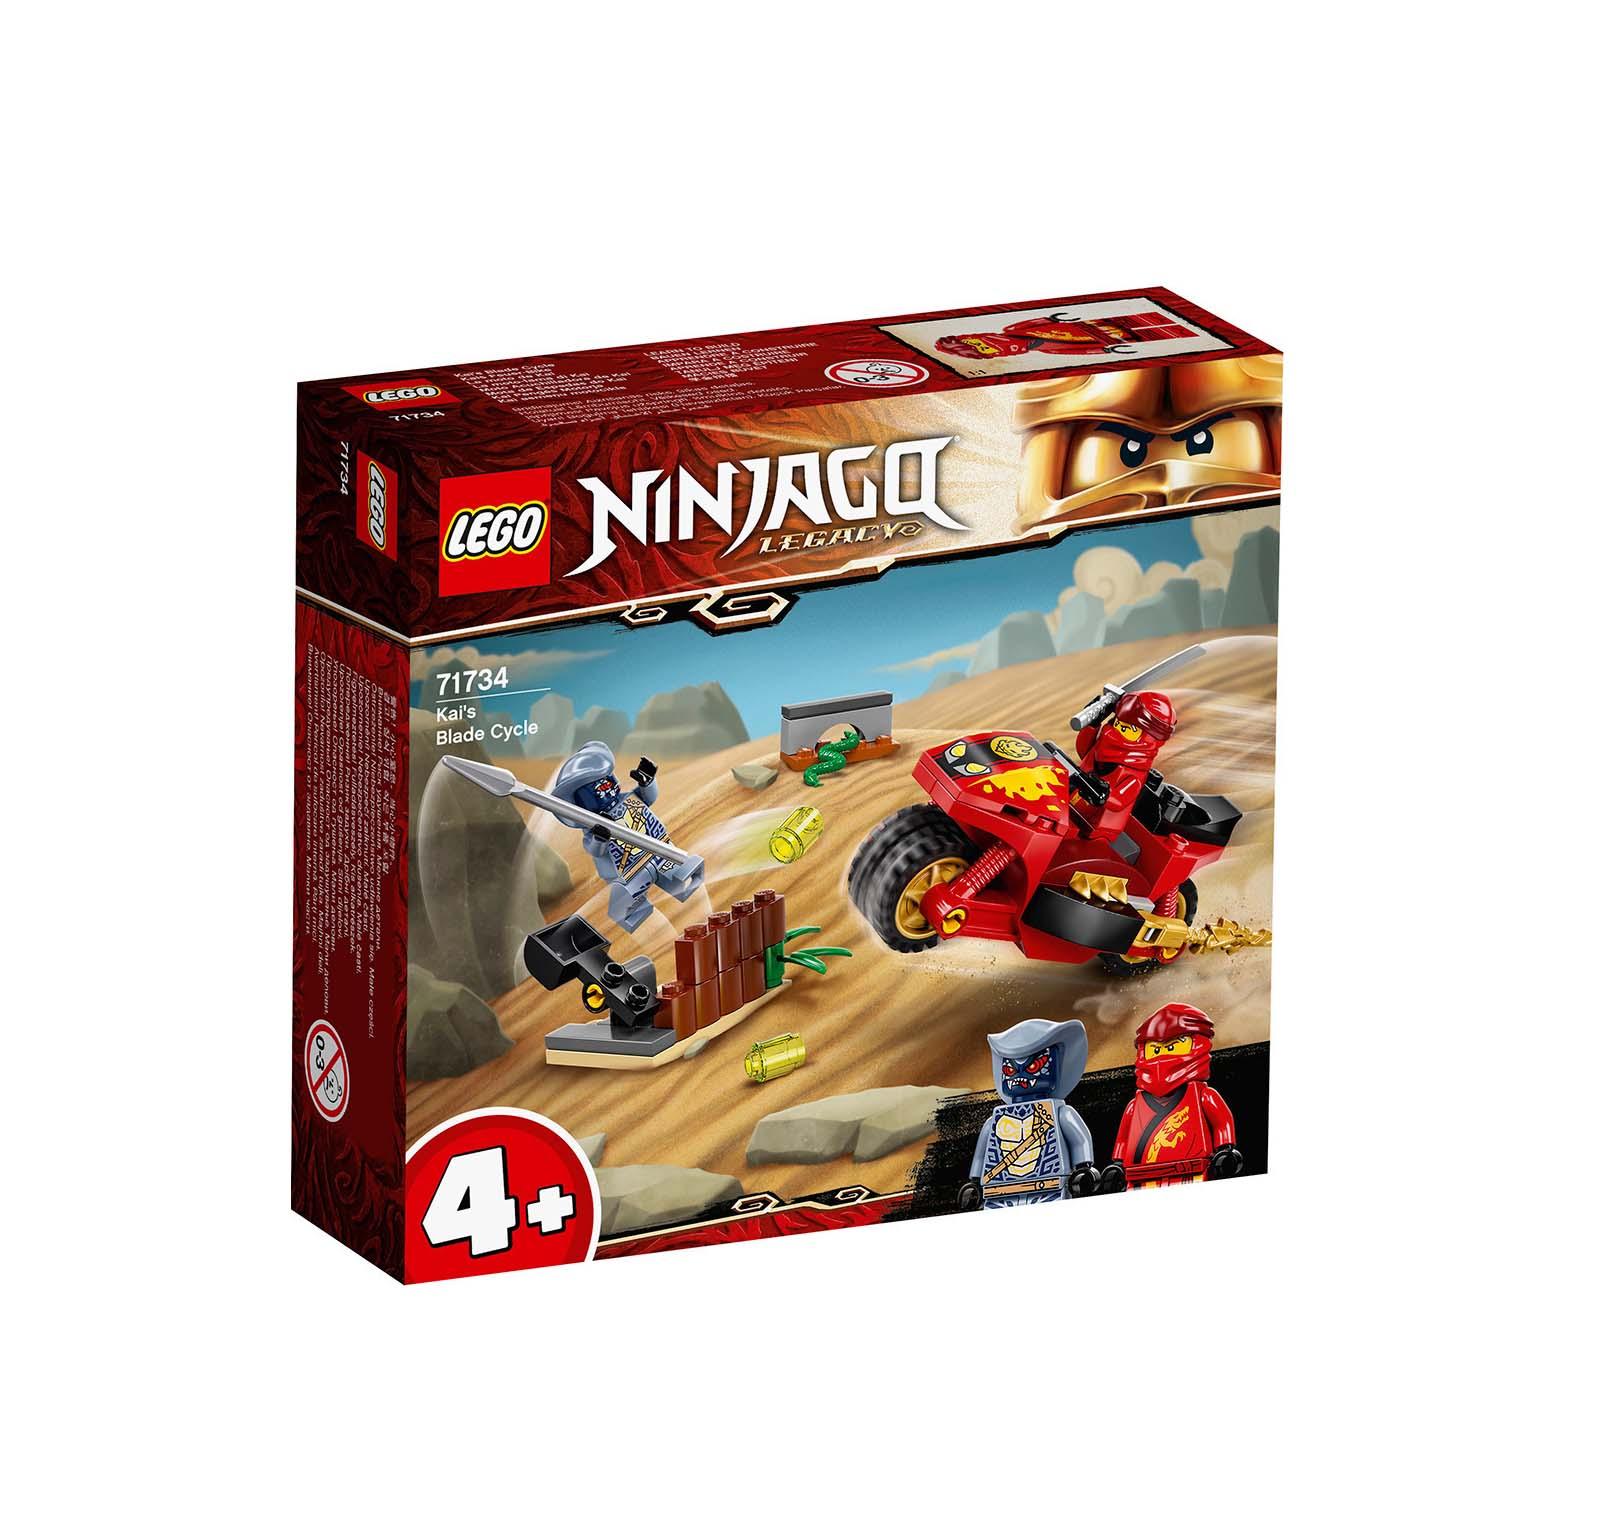 Lego Ninjago: Kai's Blade Cycle 71734